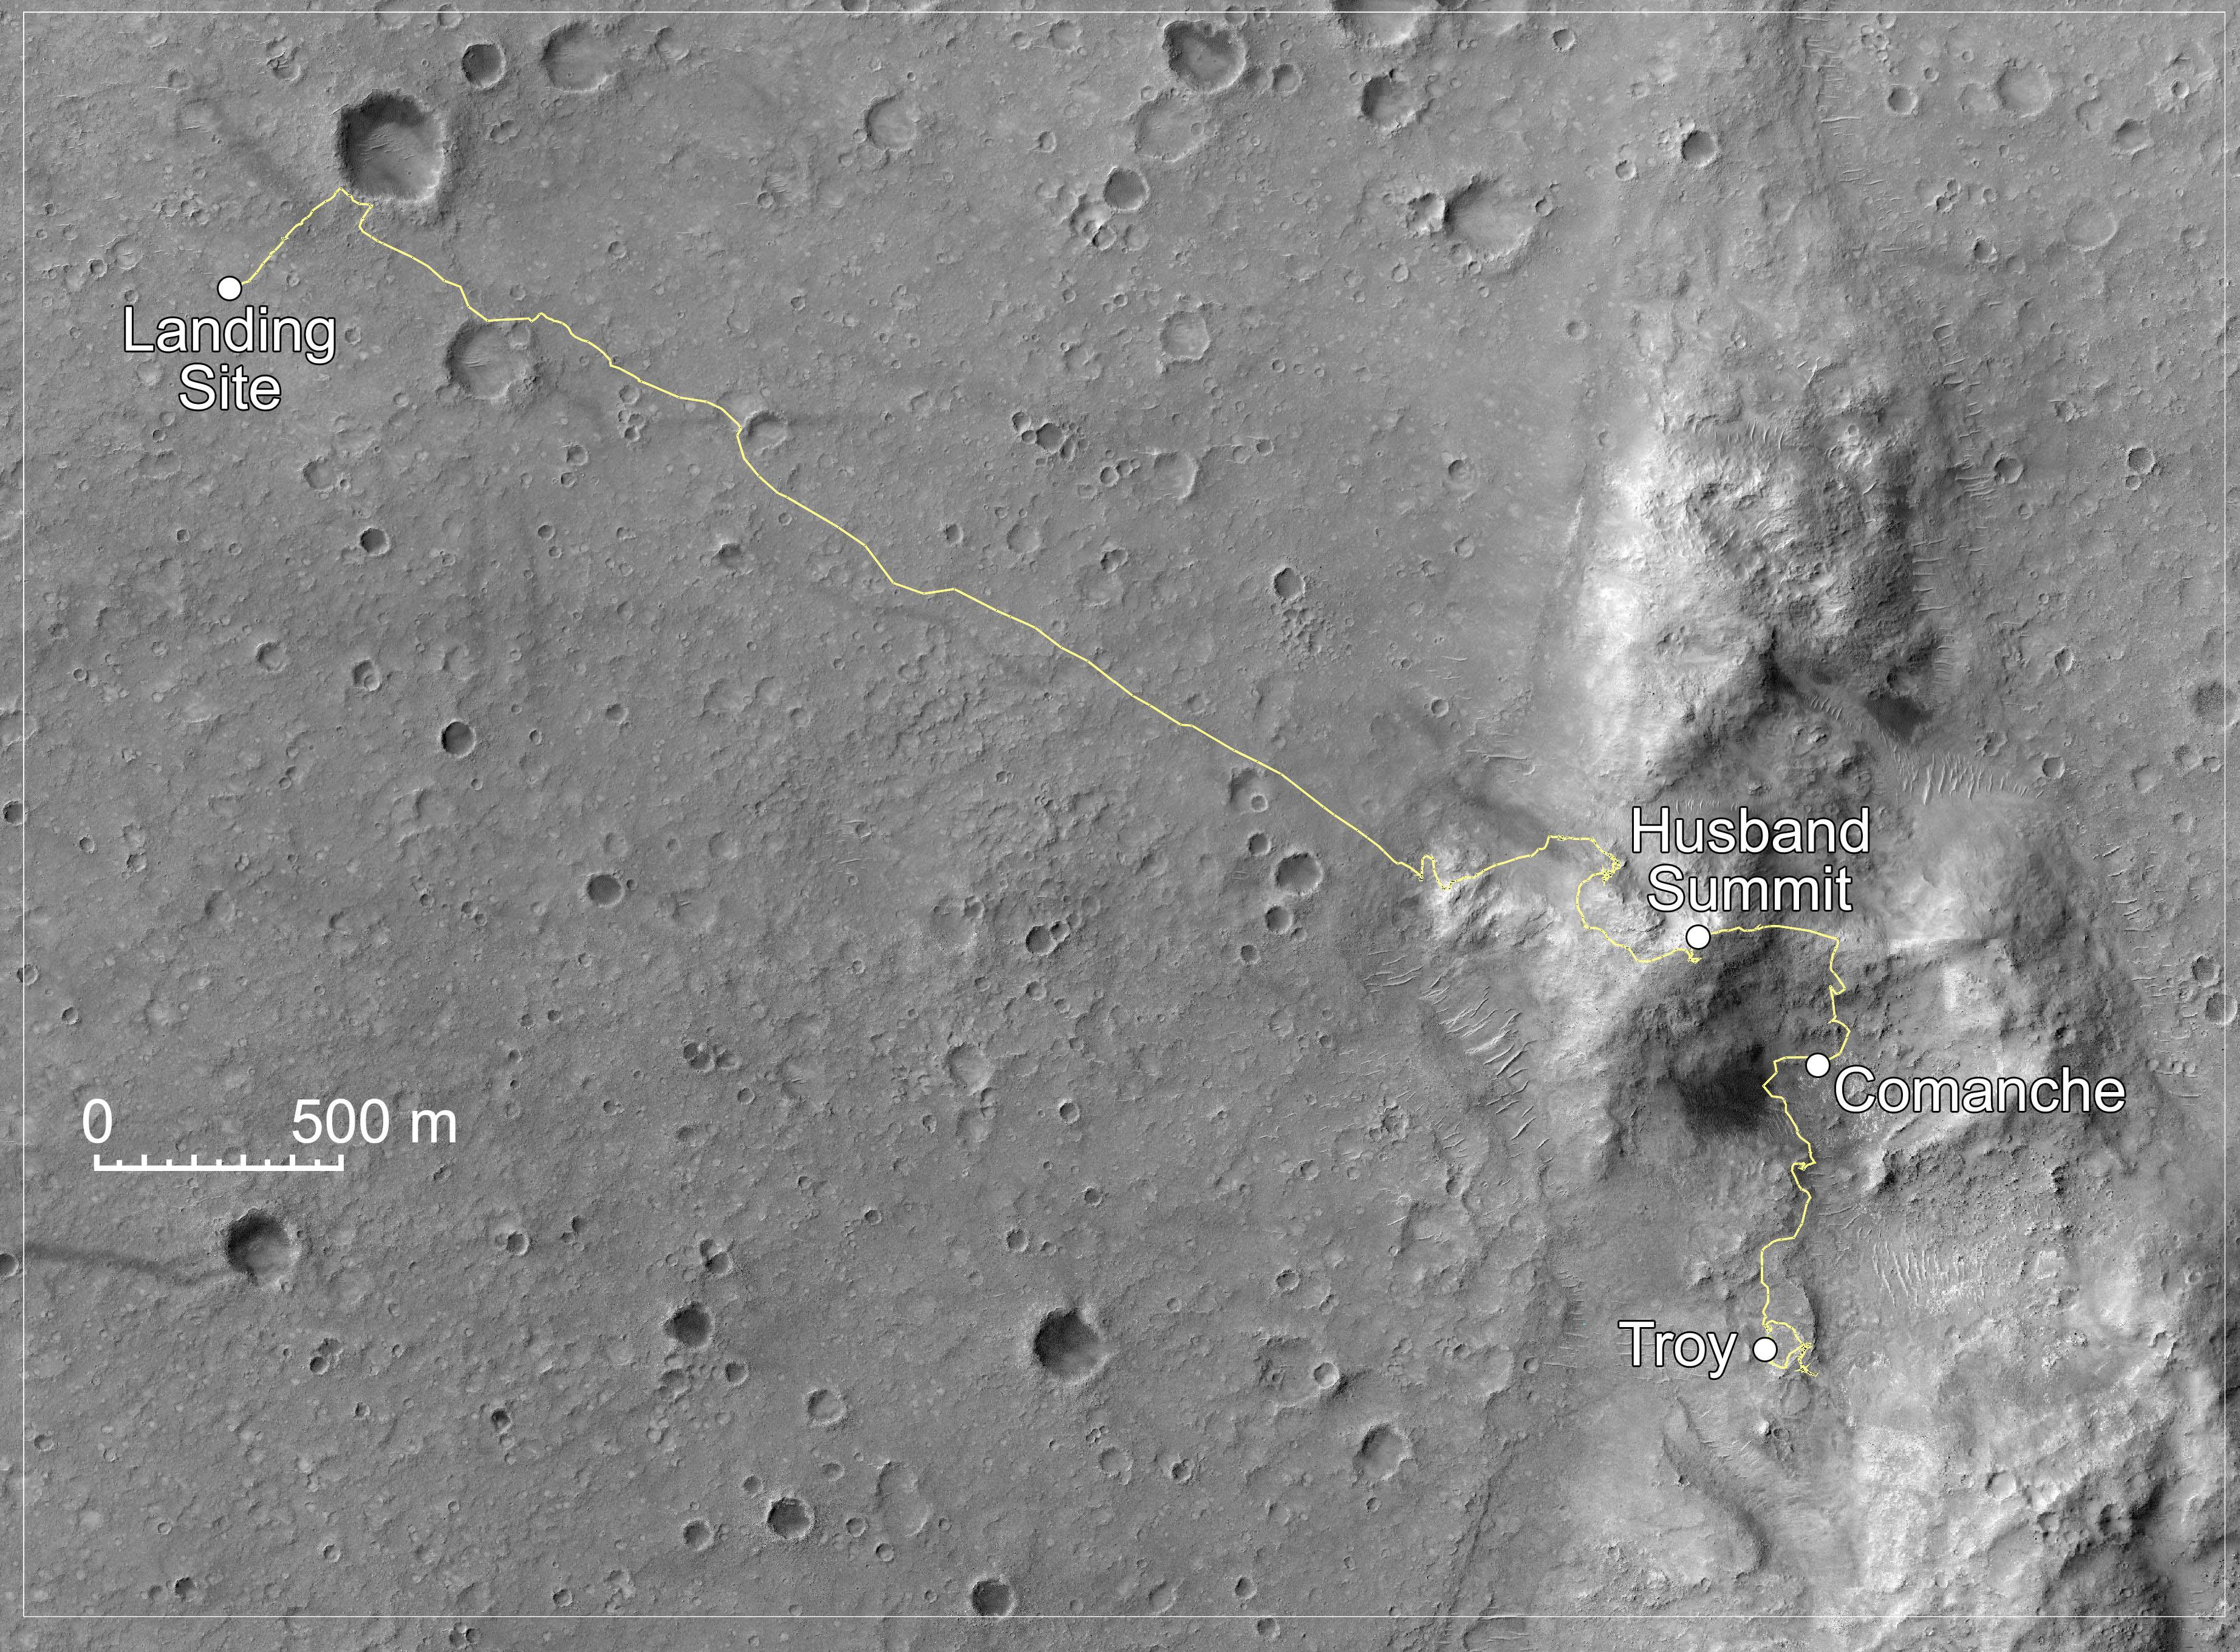 NASA - NASA Rover Finds Clue to Mars' Past and Environment ...